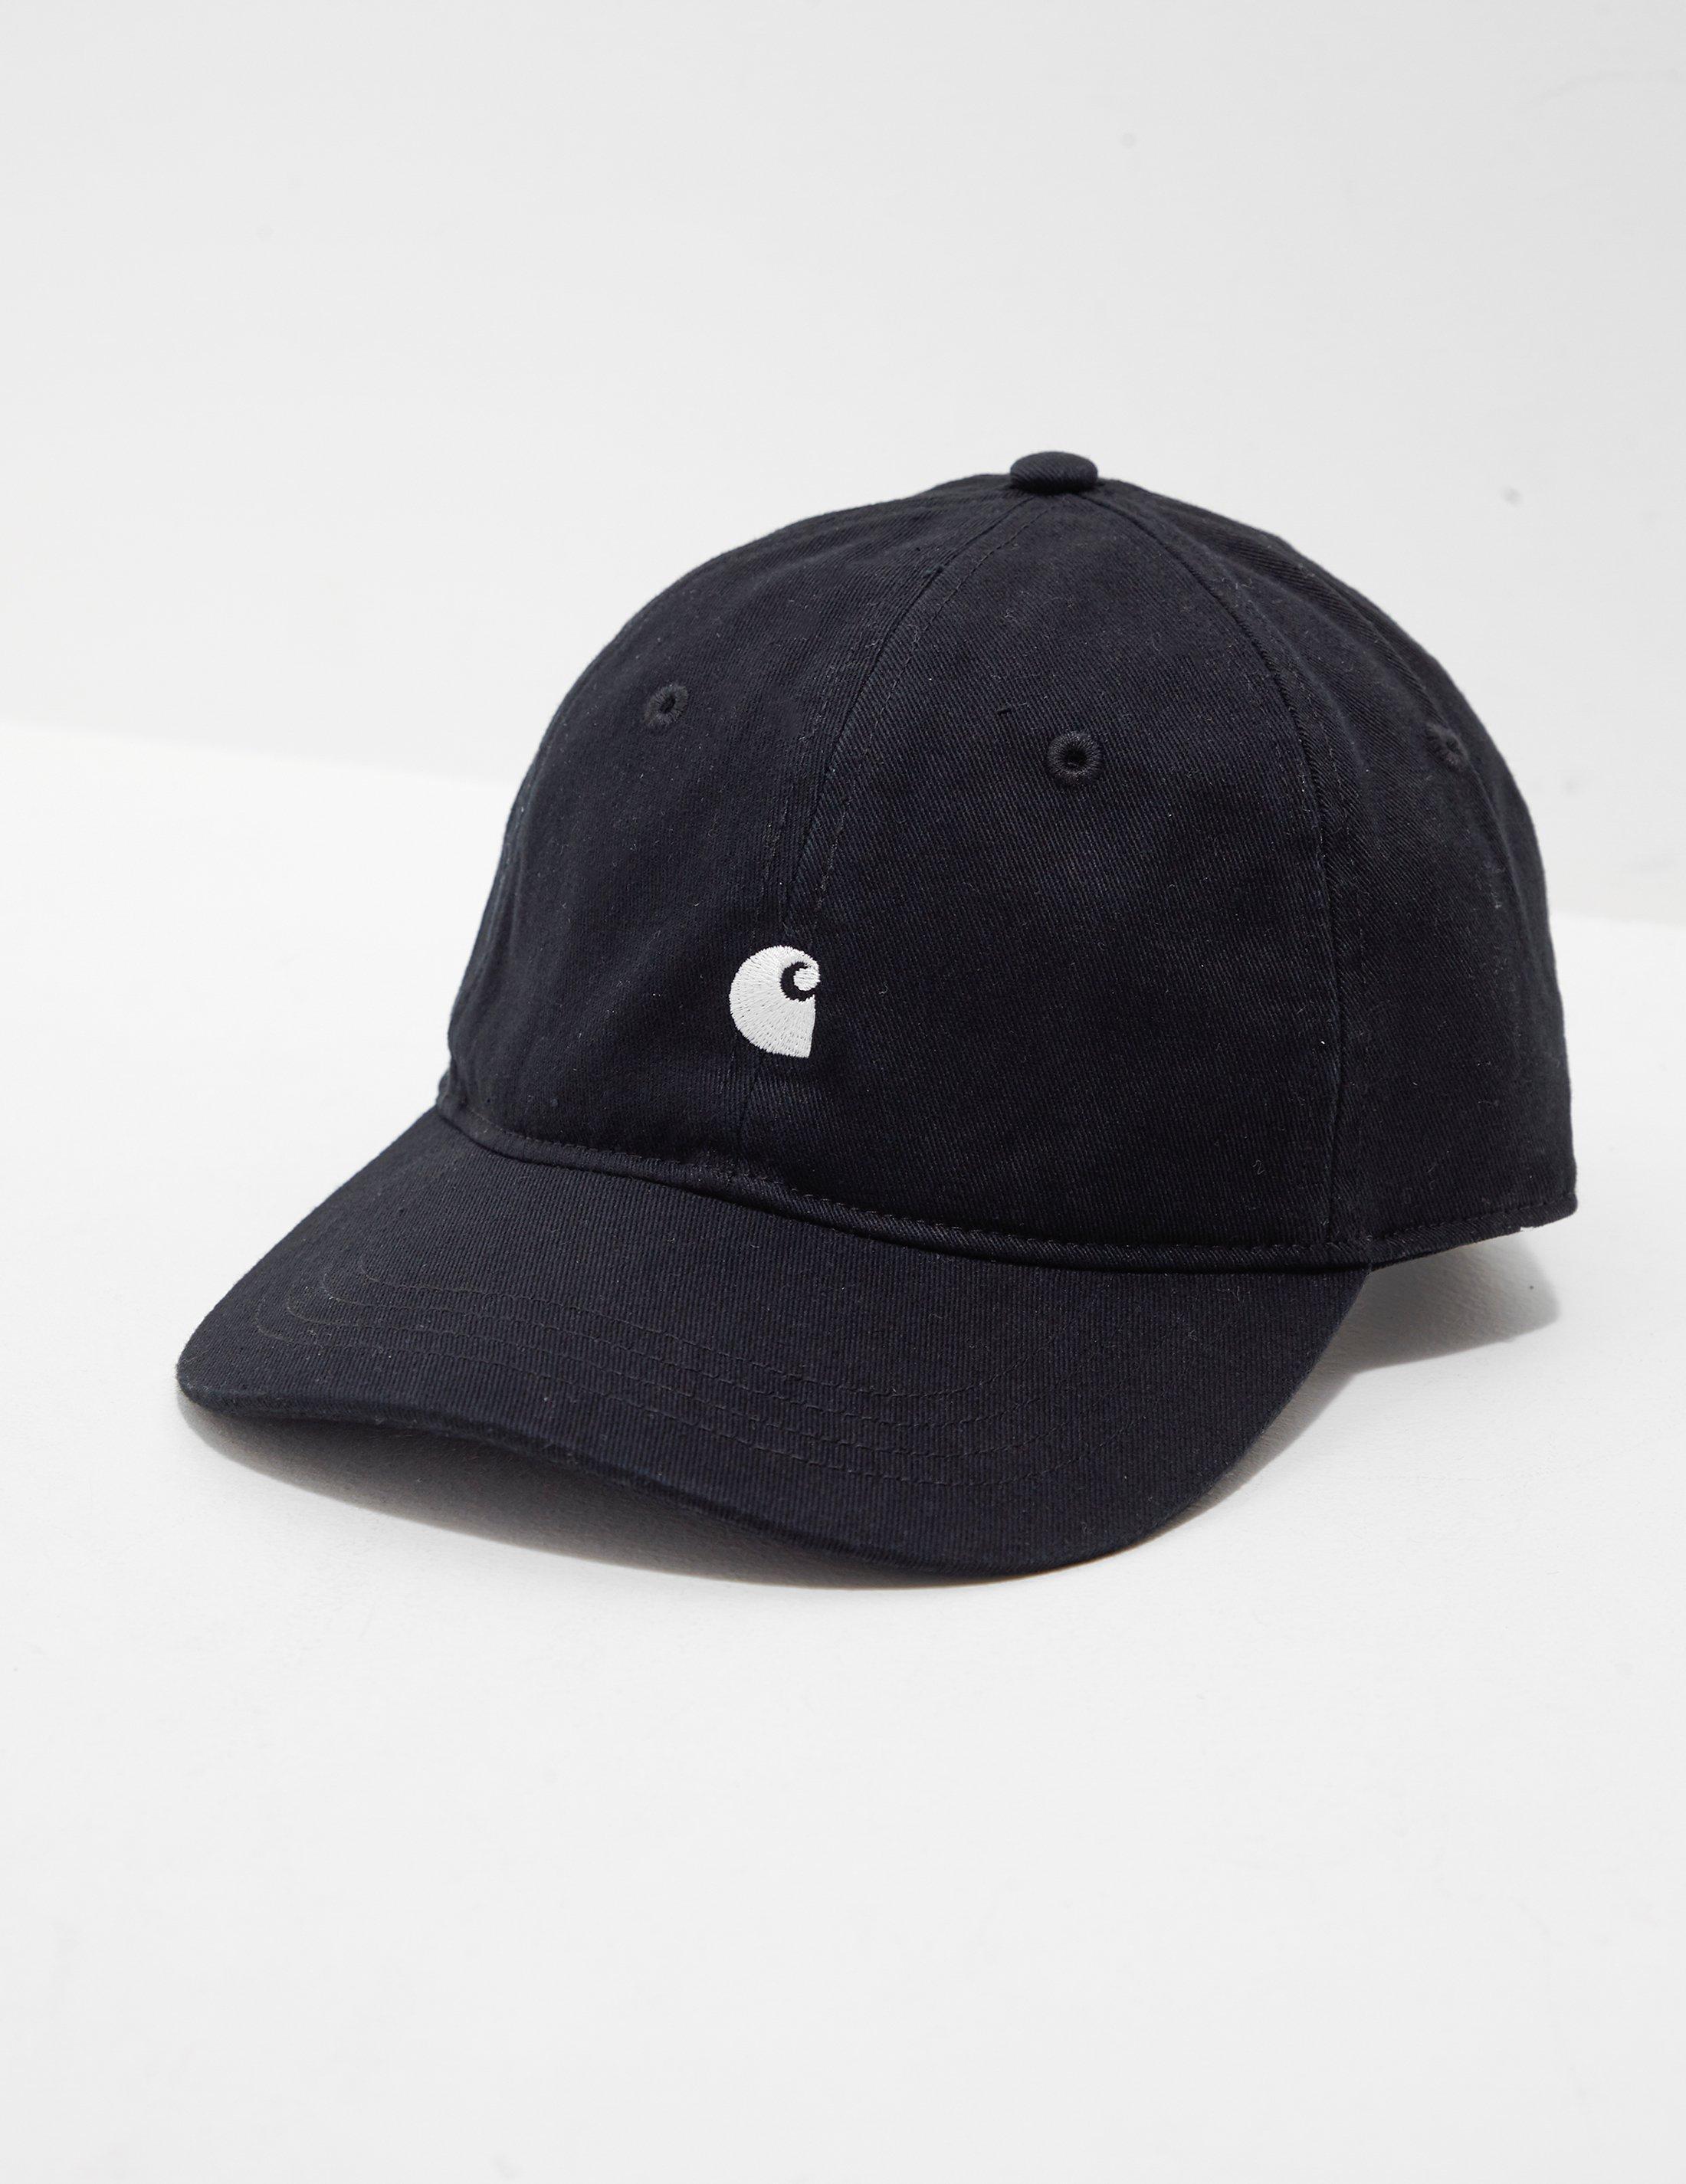 c752005b891 Carhartt Wip Mens Madison Cap Black in Black for Men - Lyst